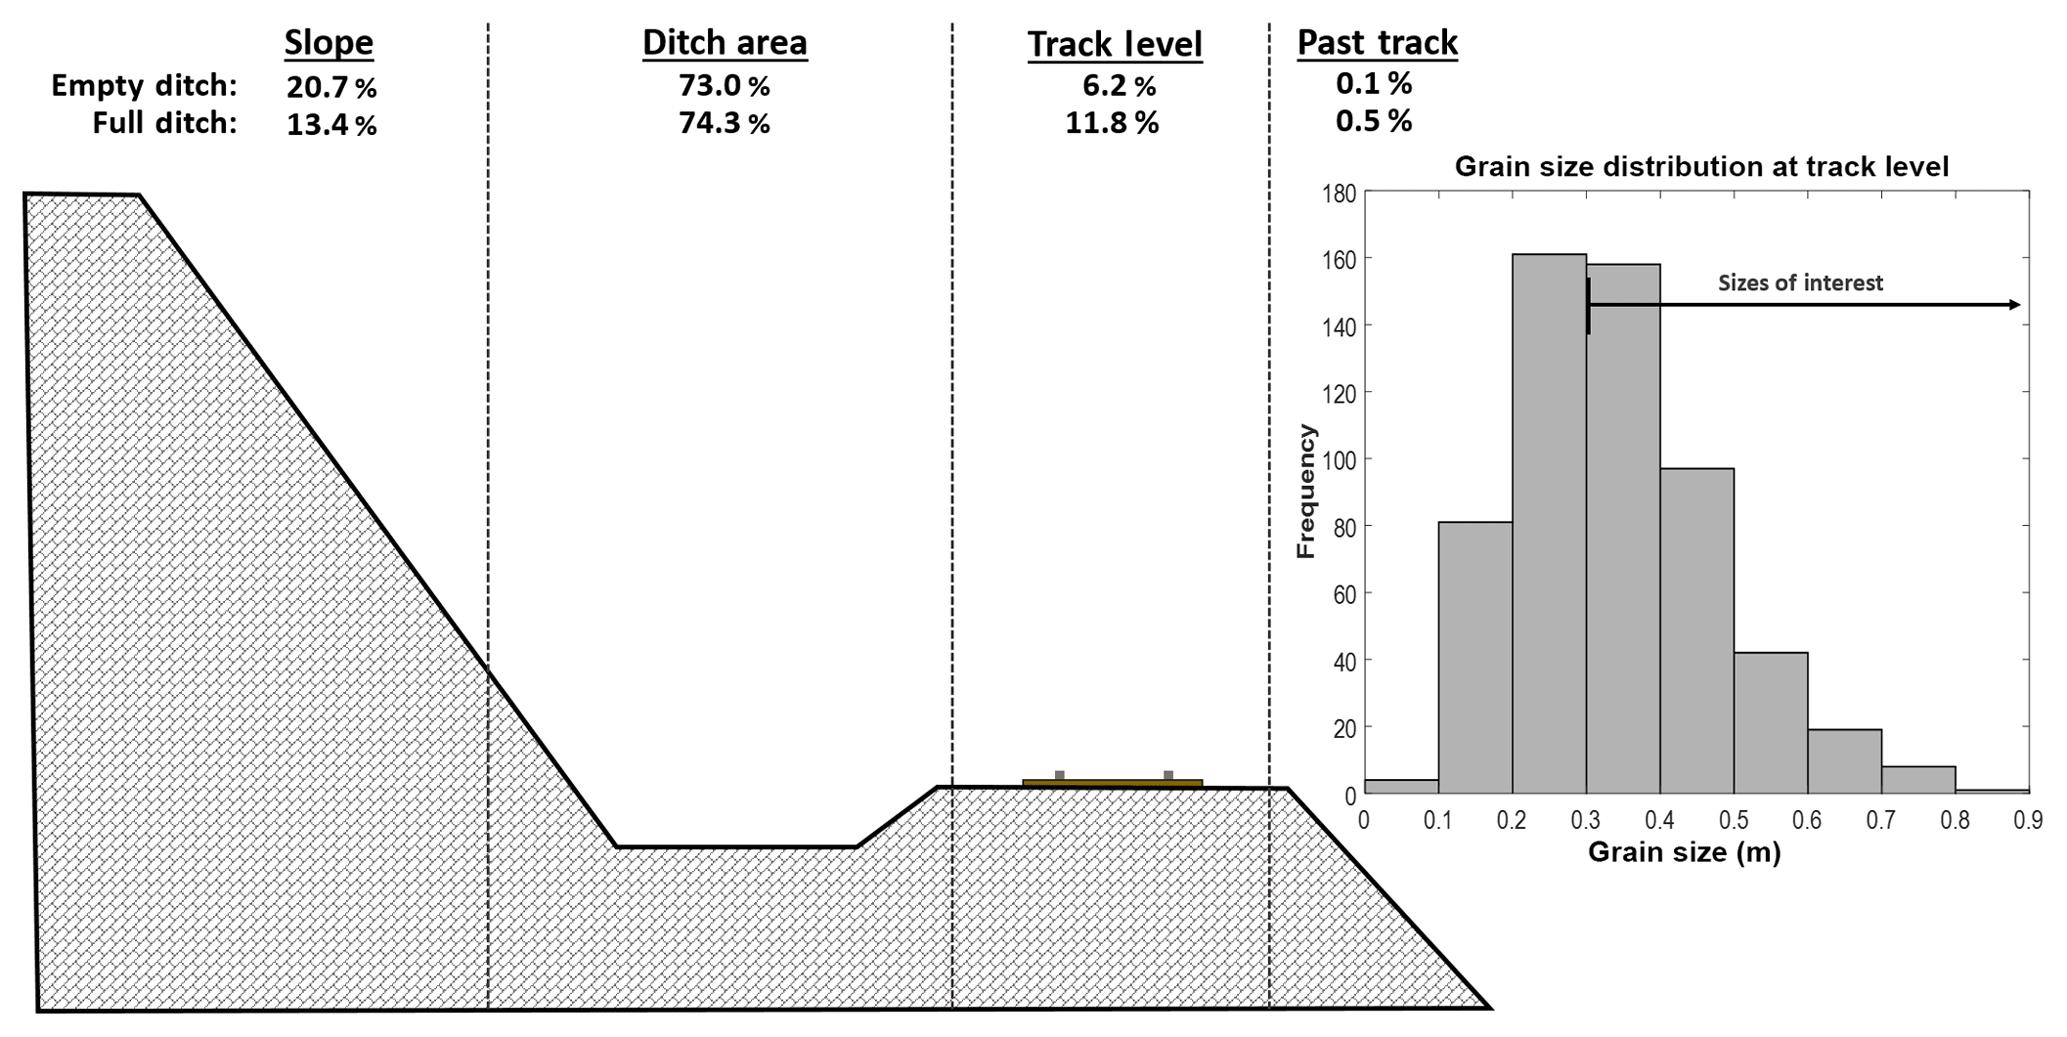 🏆 [DIAGRAM in Pictures Database] Wiring Diagram 2007 Viking Epic Just  Download or Read Viking Epic -  GENEVIEVE.HASENOHR.DIABLOSPORT-TRINITY.READER.ONYXUM.COMComplete Diagram Picture Database - Onyxum.com